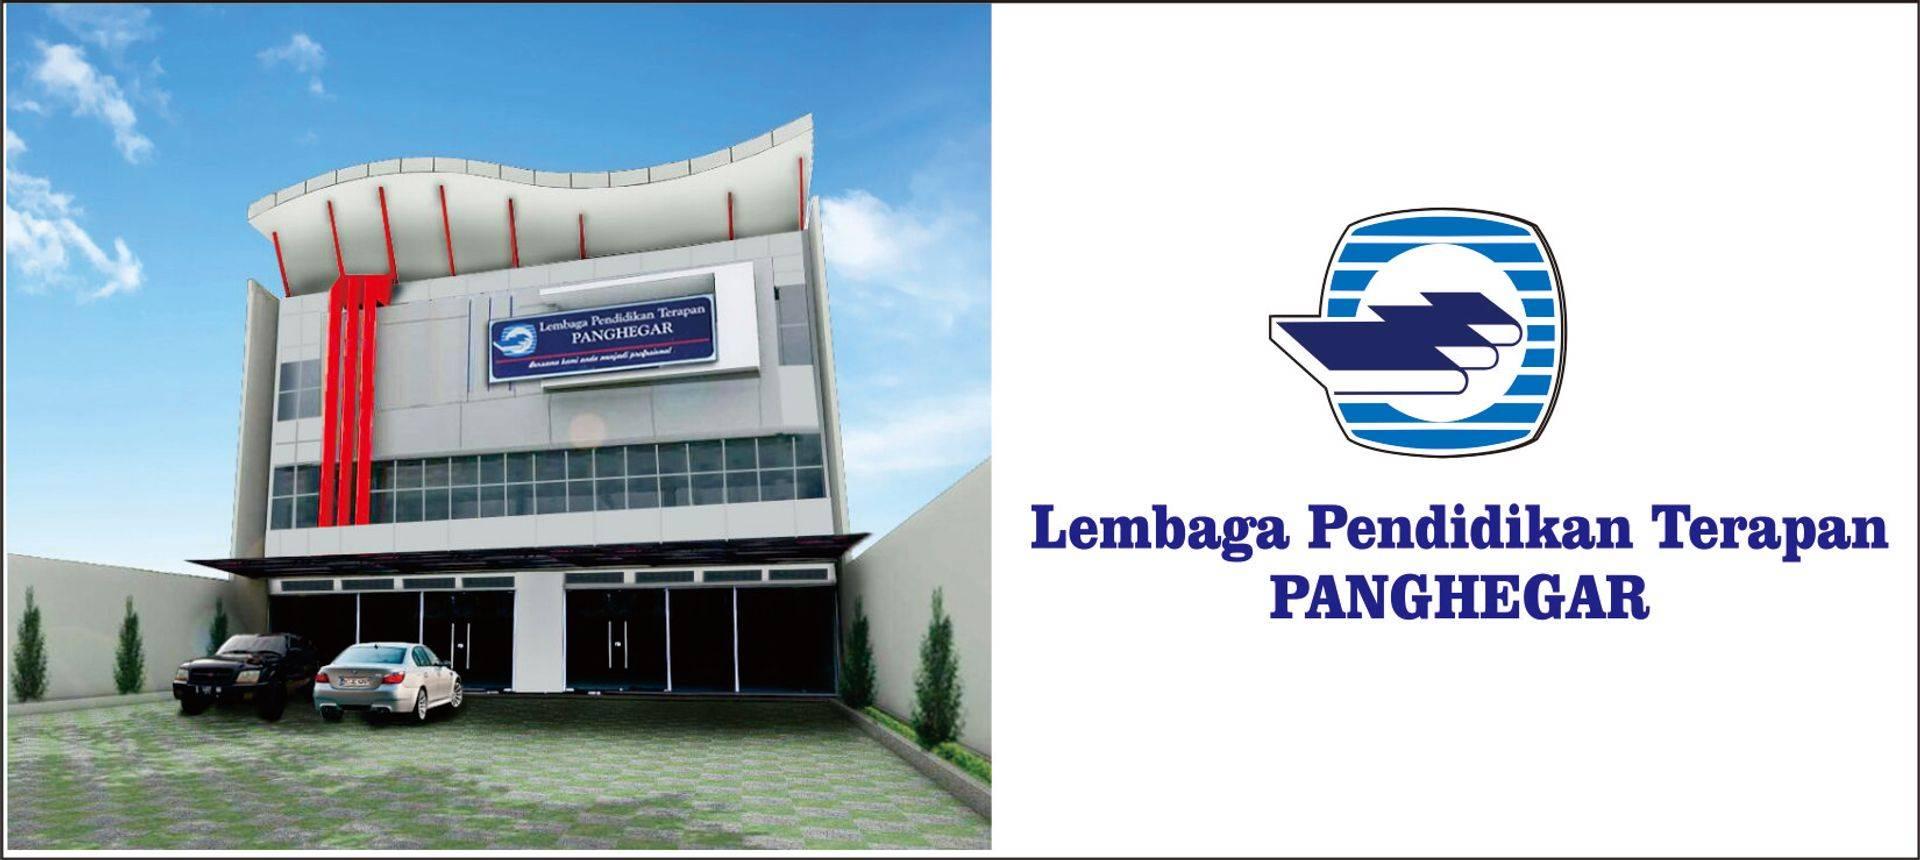 Kampus Baru LPT Panghegar